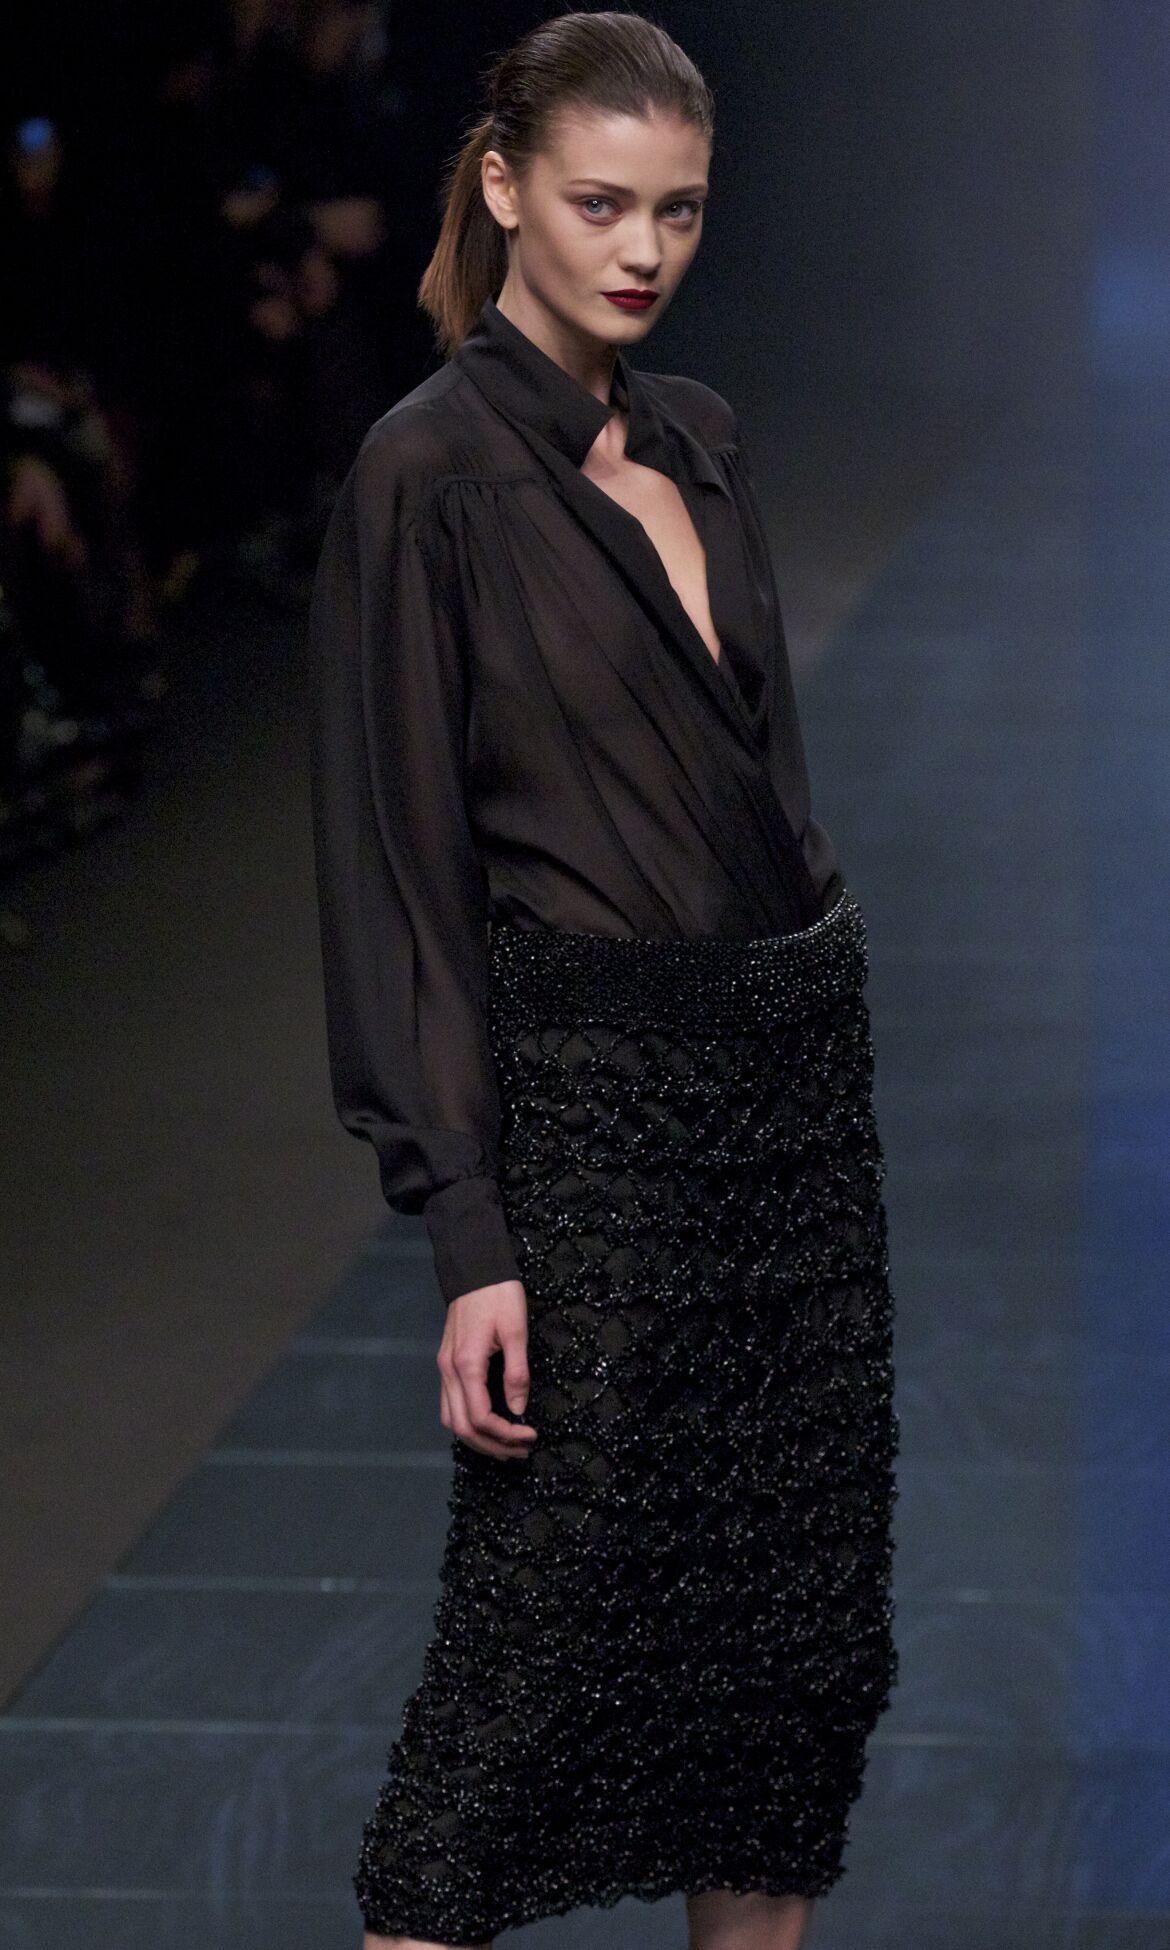 Fall Winter 2013 14 Fashion Women's Collection Anteprima